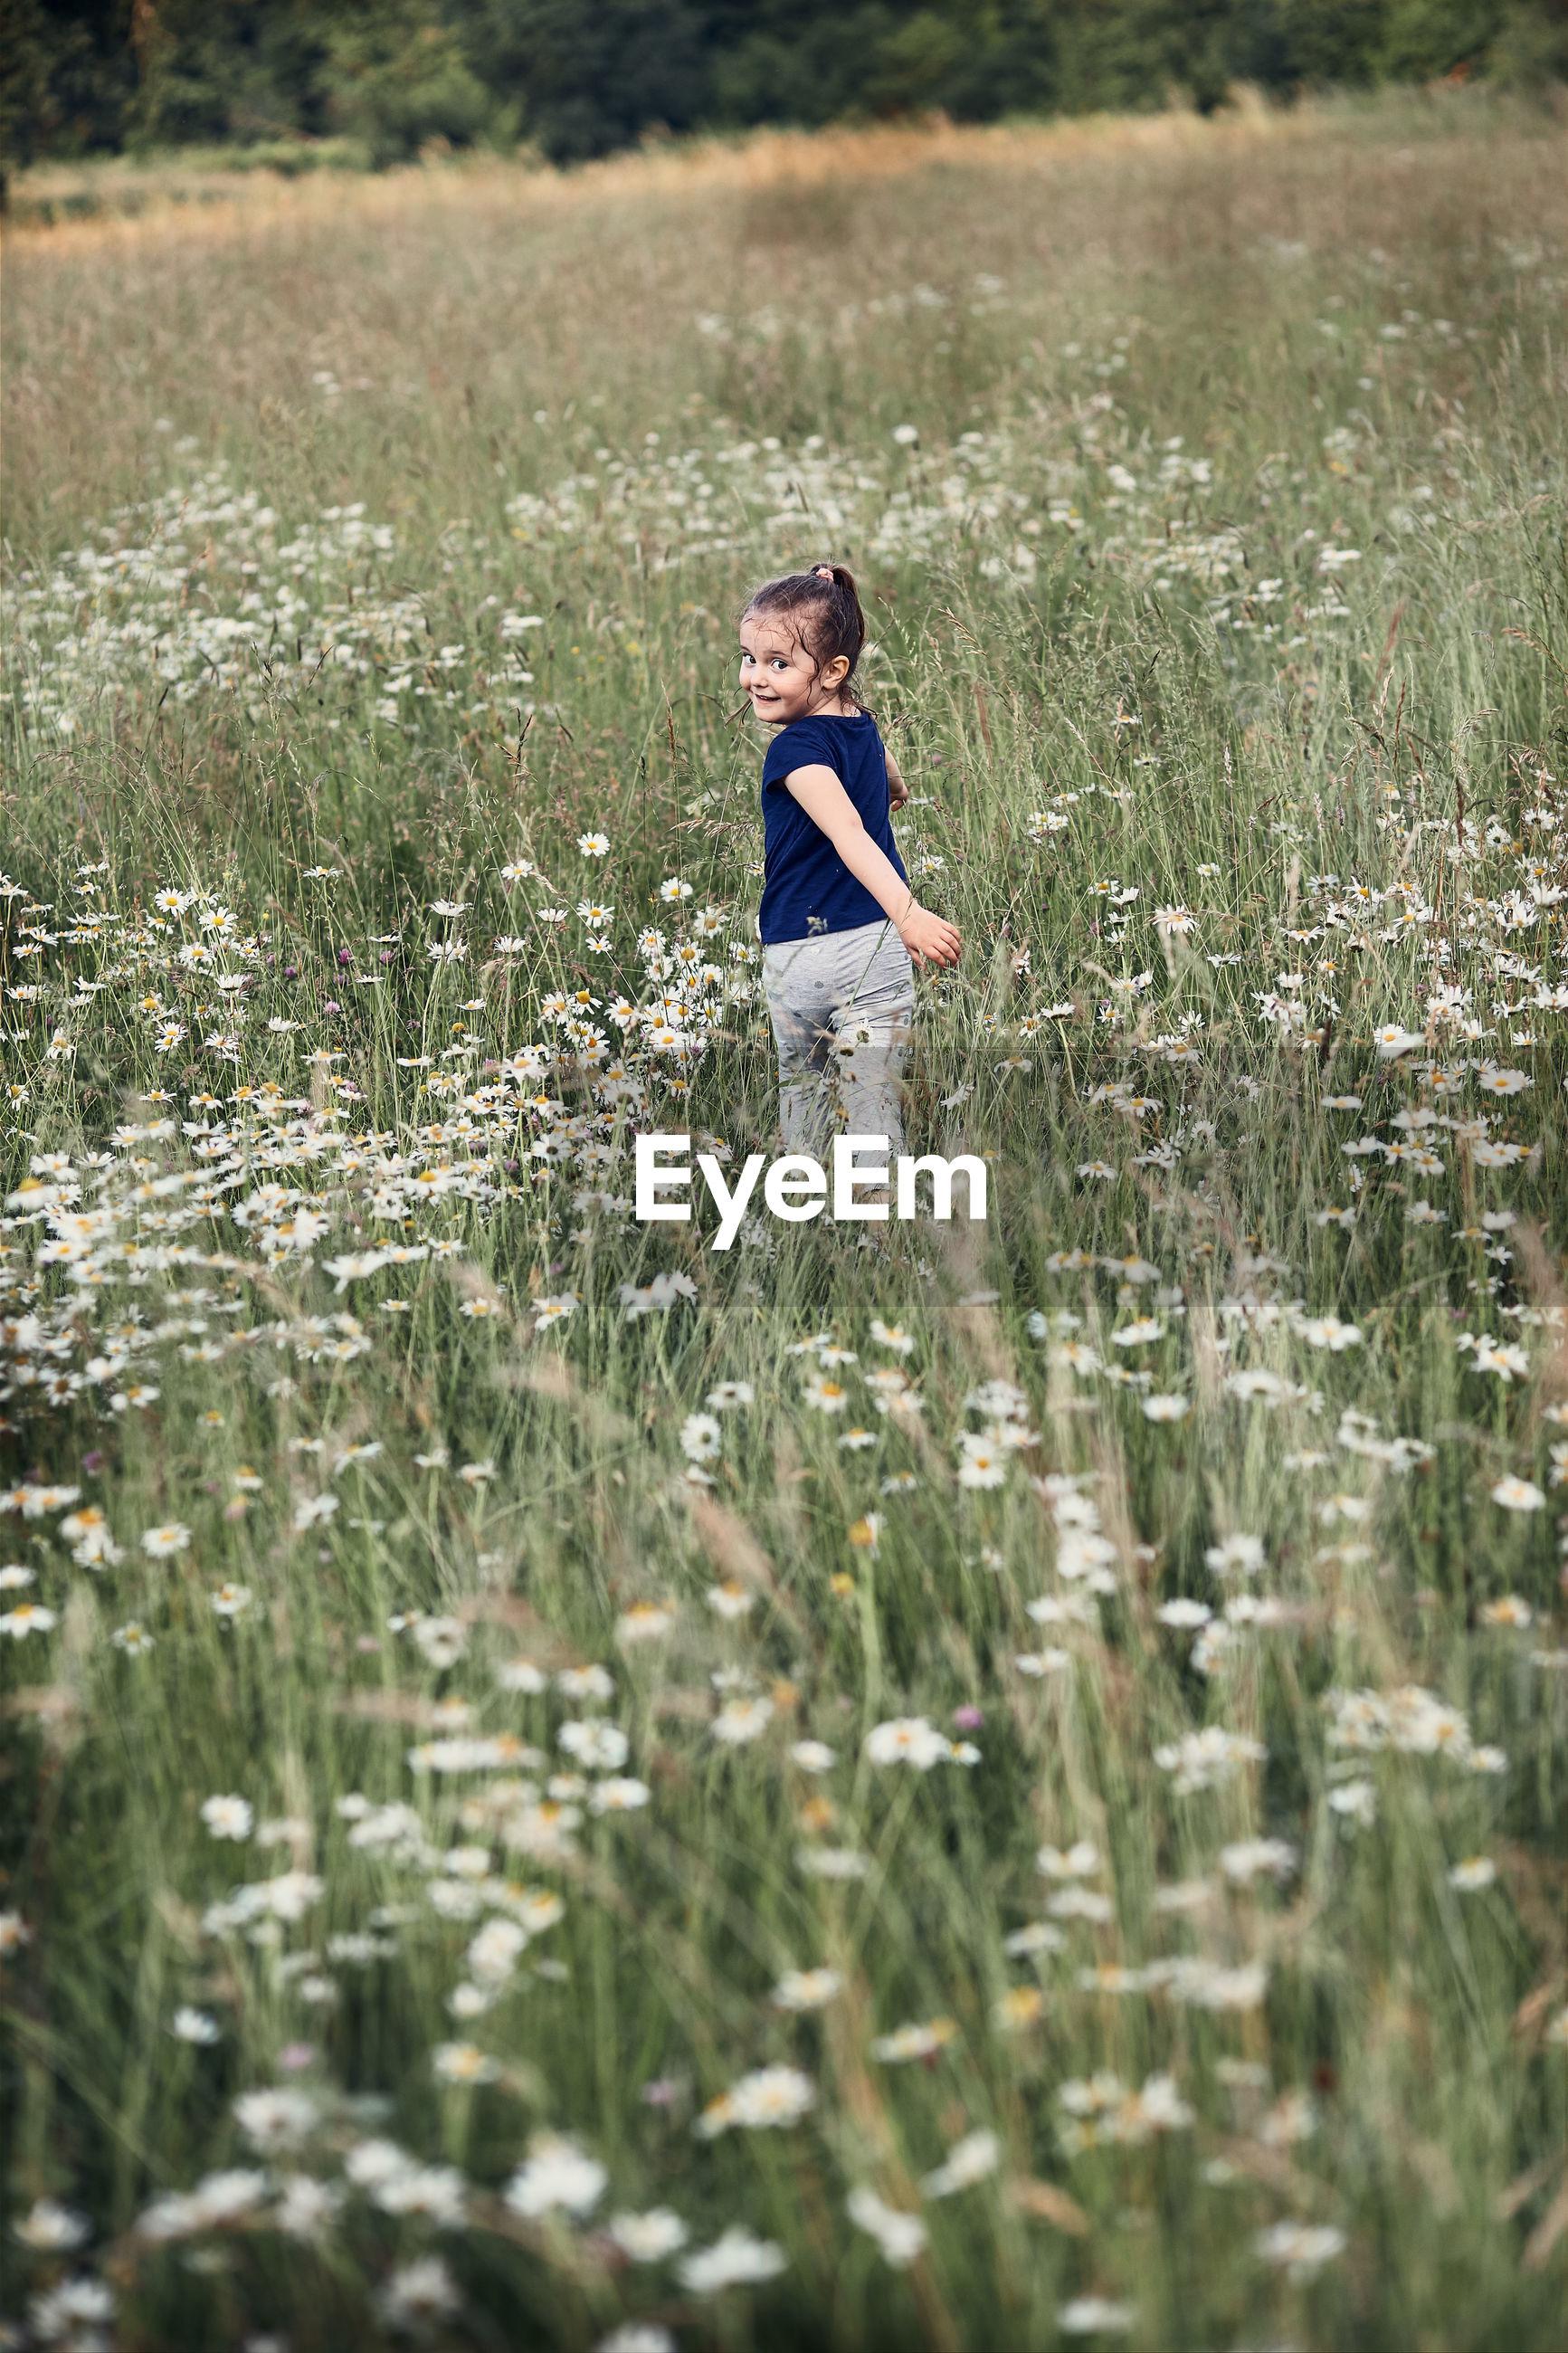 Portrait of smiling girl walking amidst plants on field